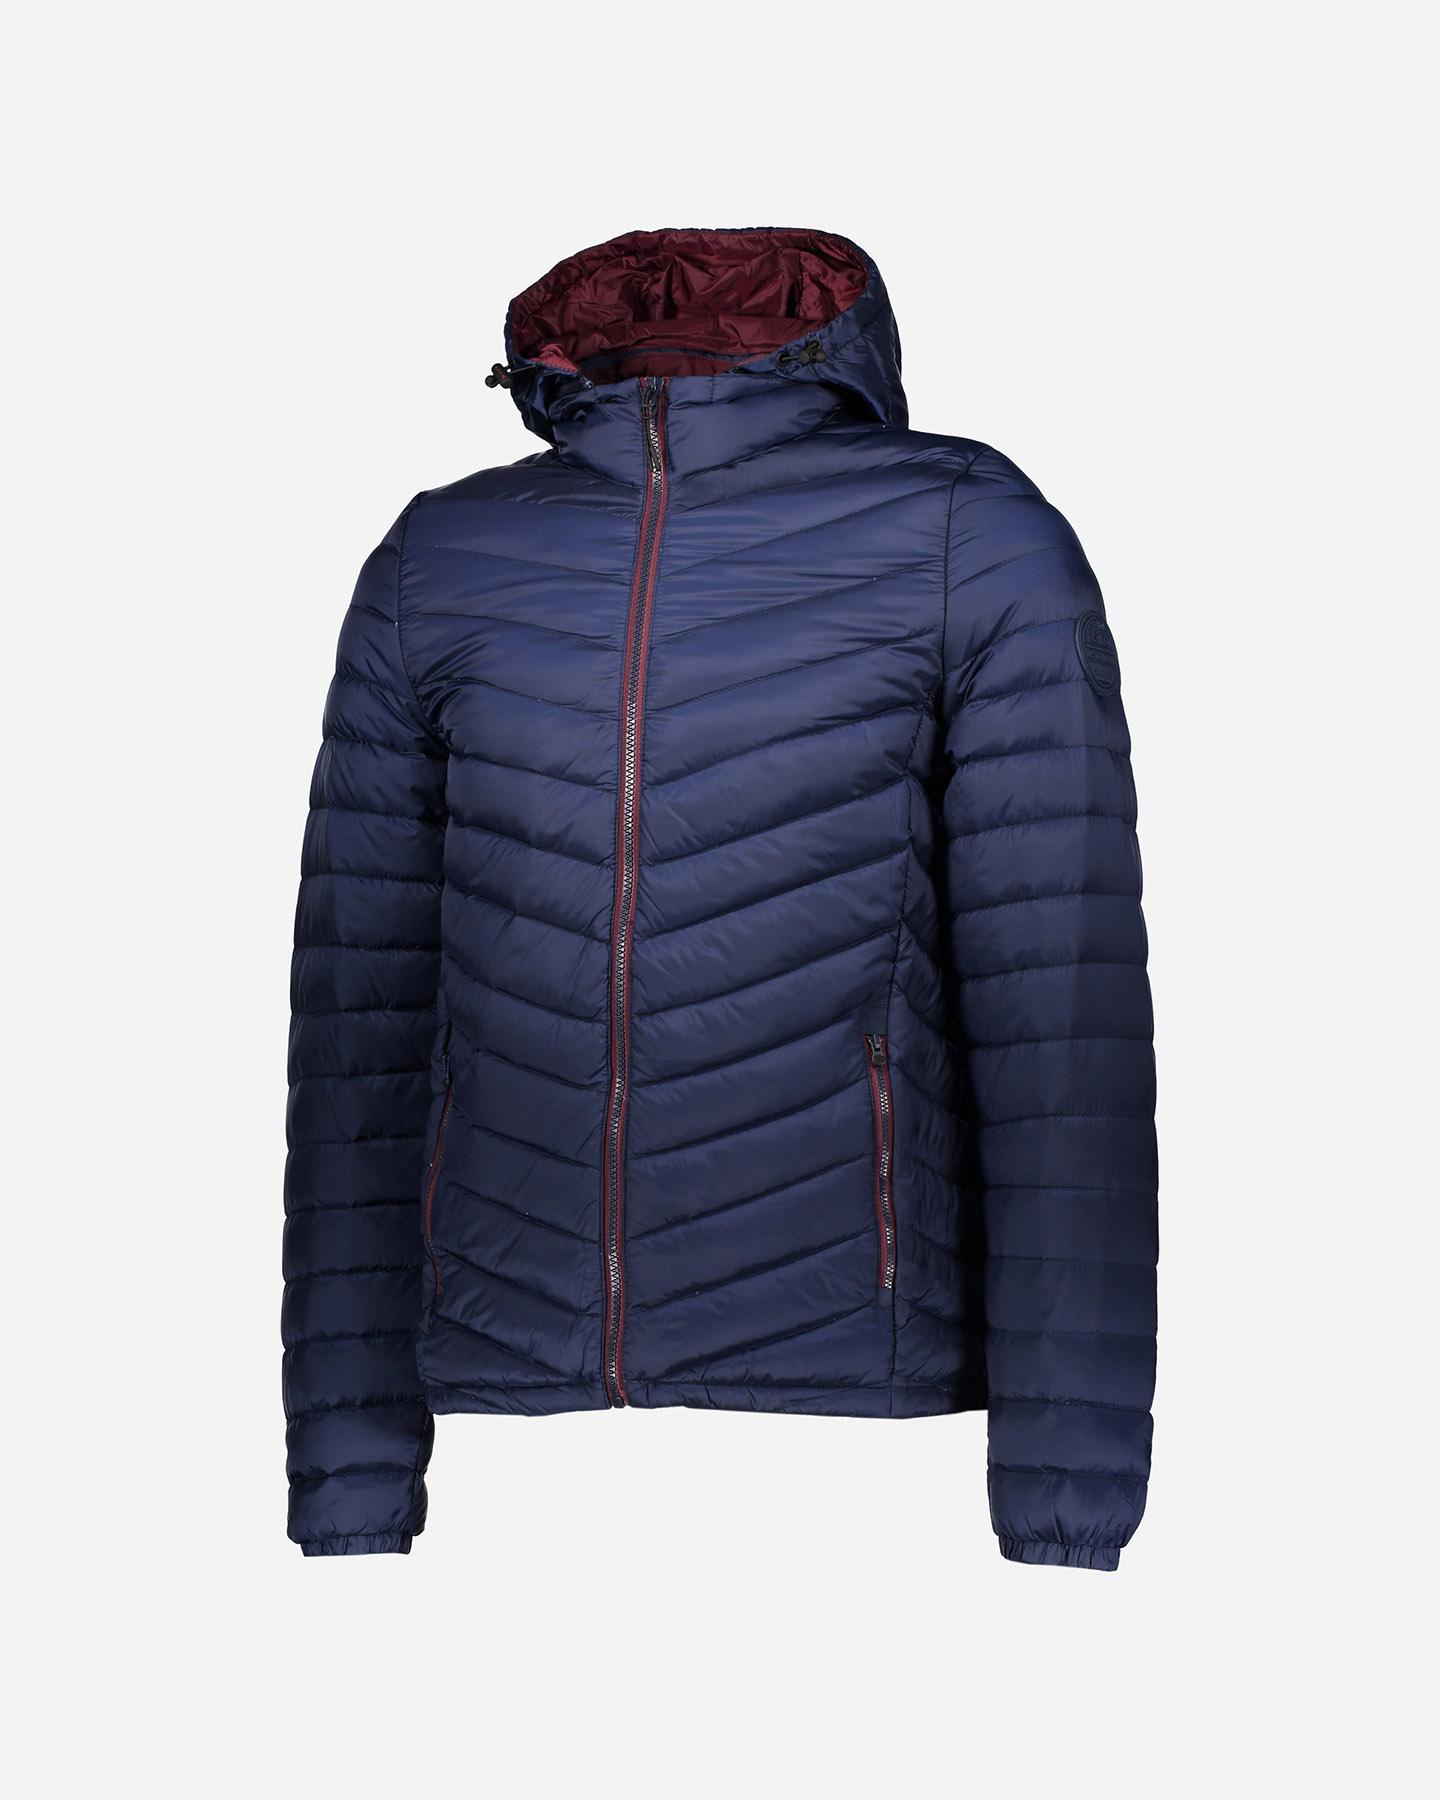 best company giacca uomo piuma outerwear